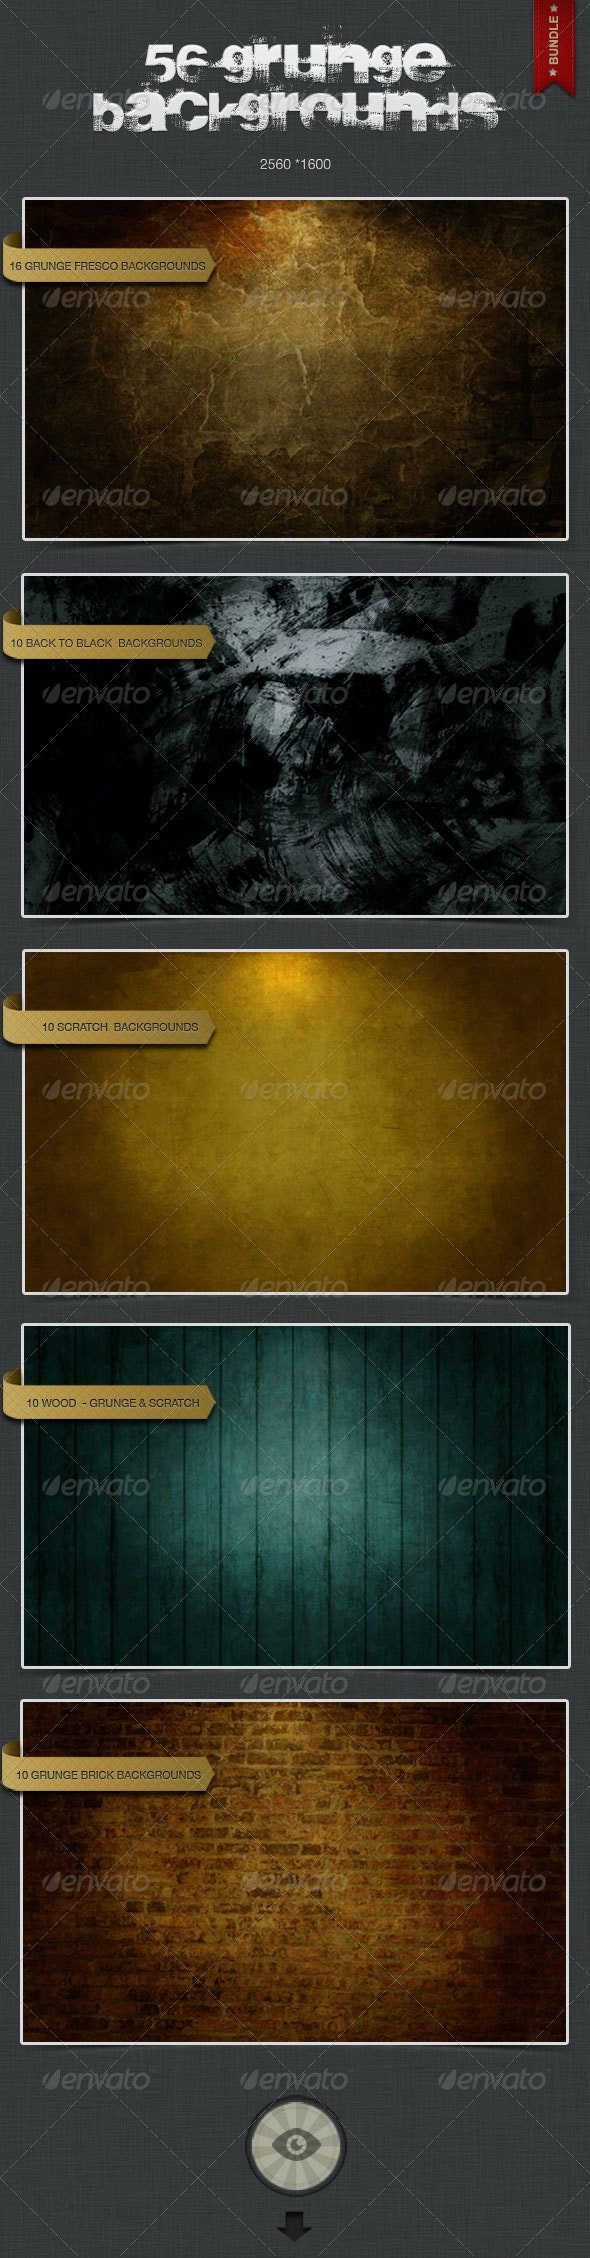 56 Grunge Backgrounds - Bundle Pack 1 - Backgrounds Graphics